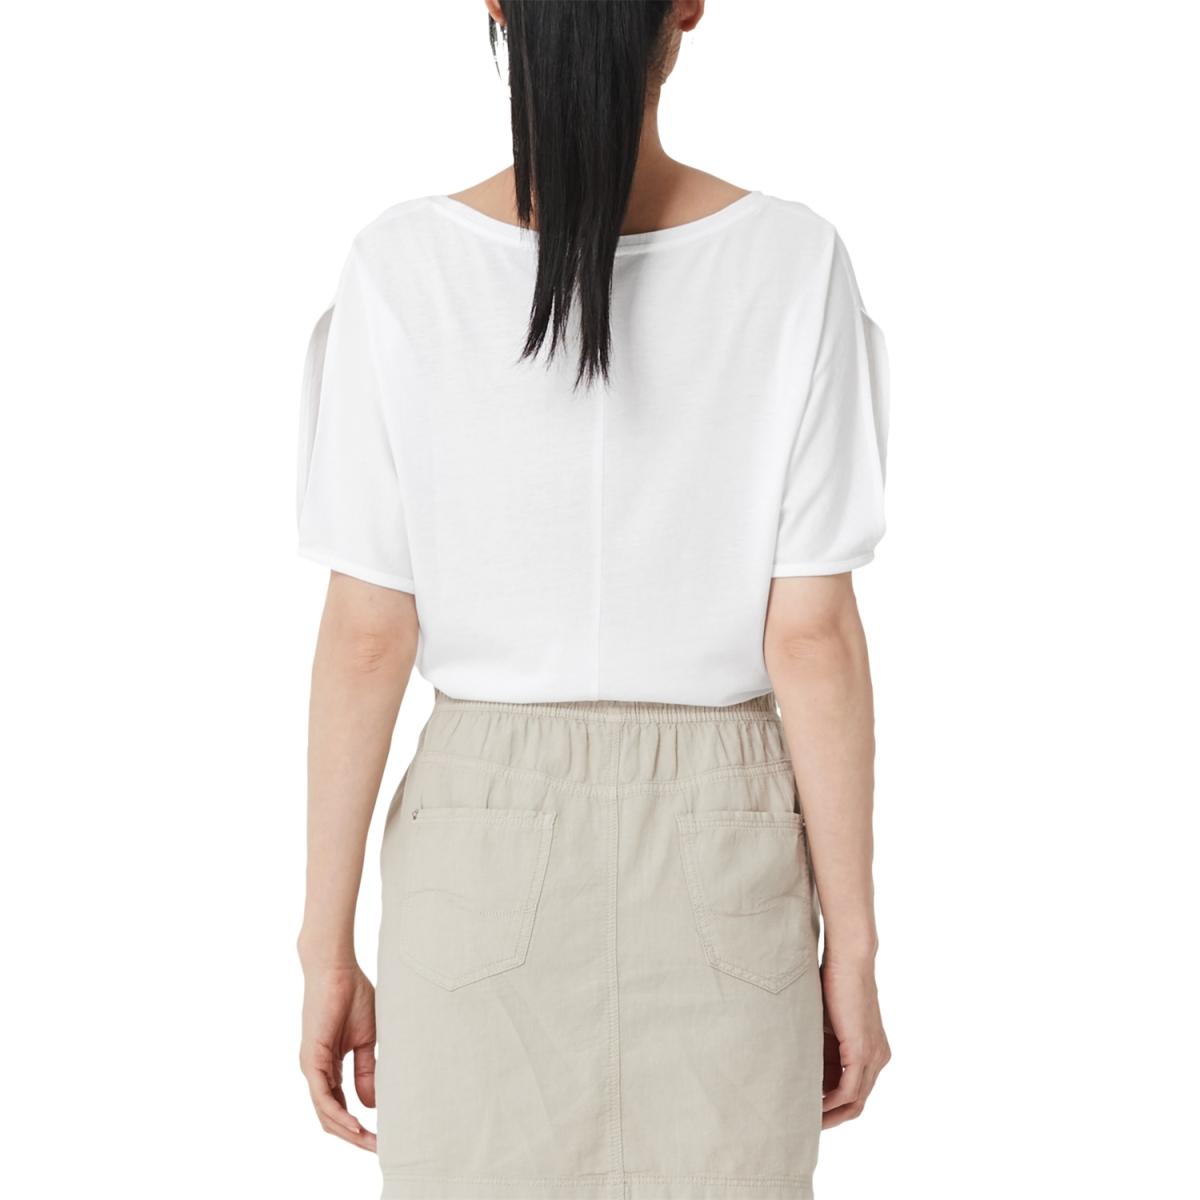 cold shoulder shirt 41907325508 q/s designed by t-shirt 0100